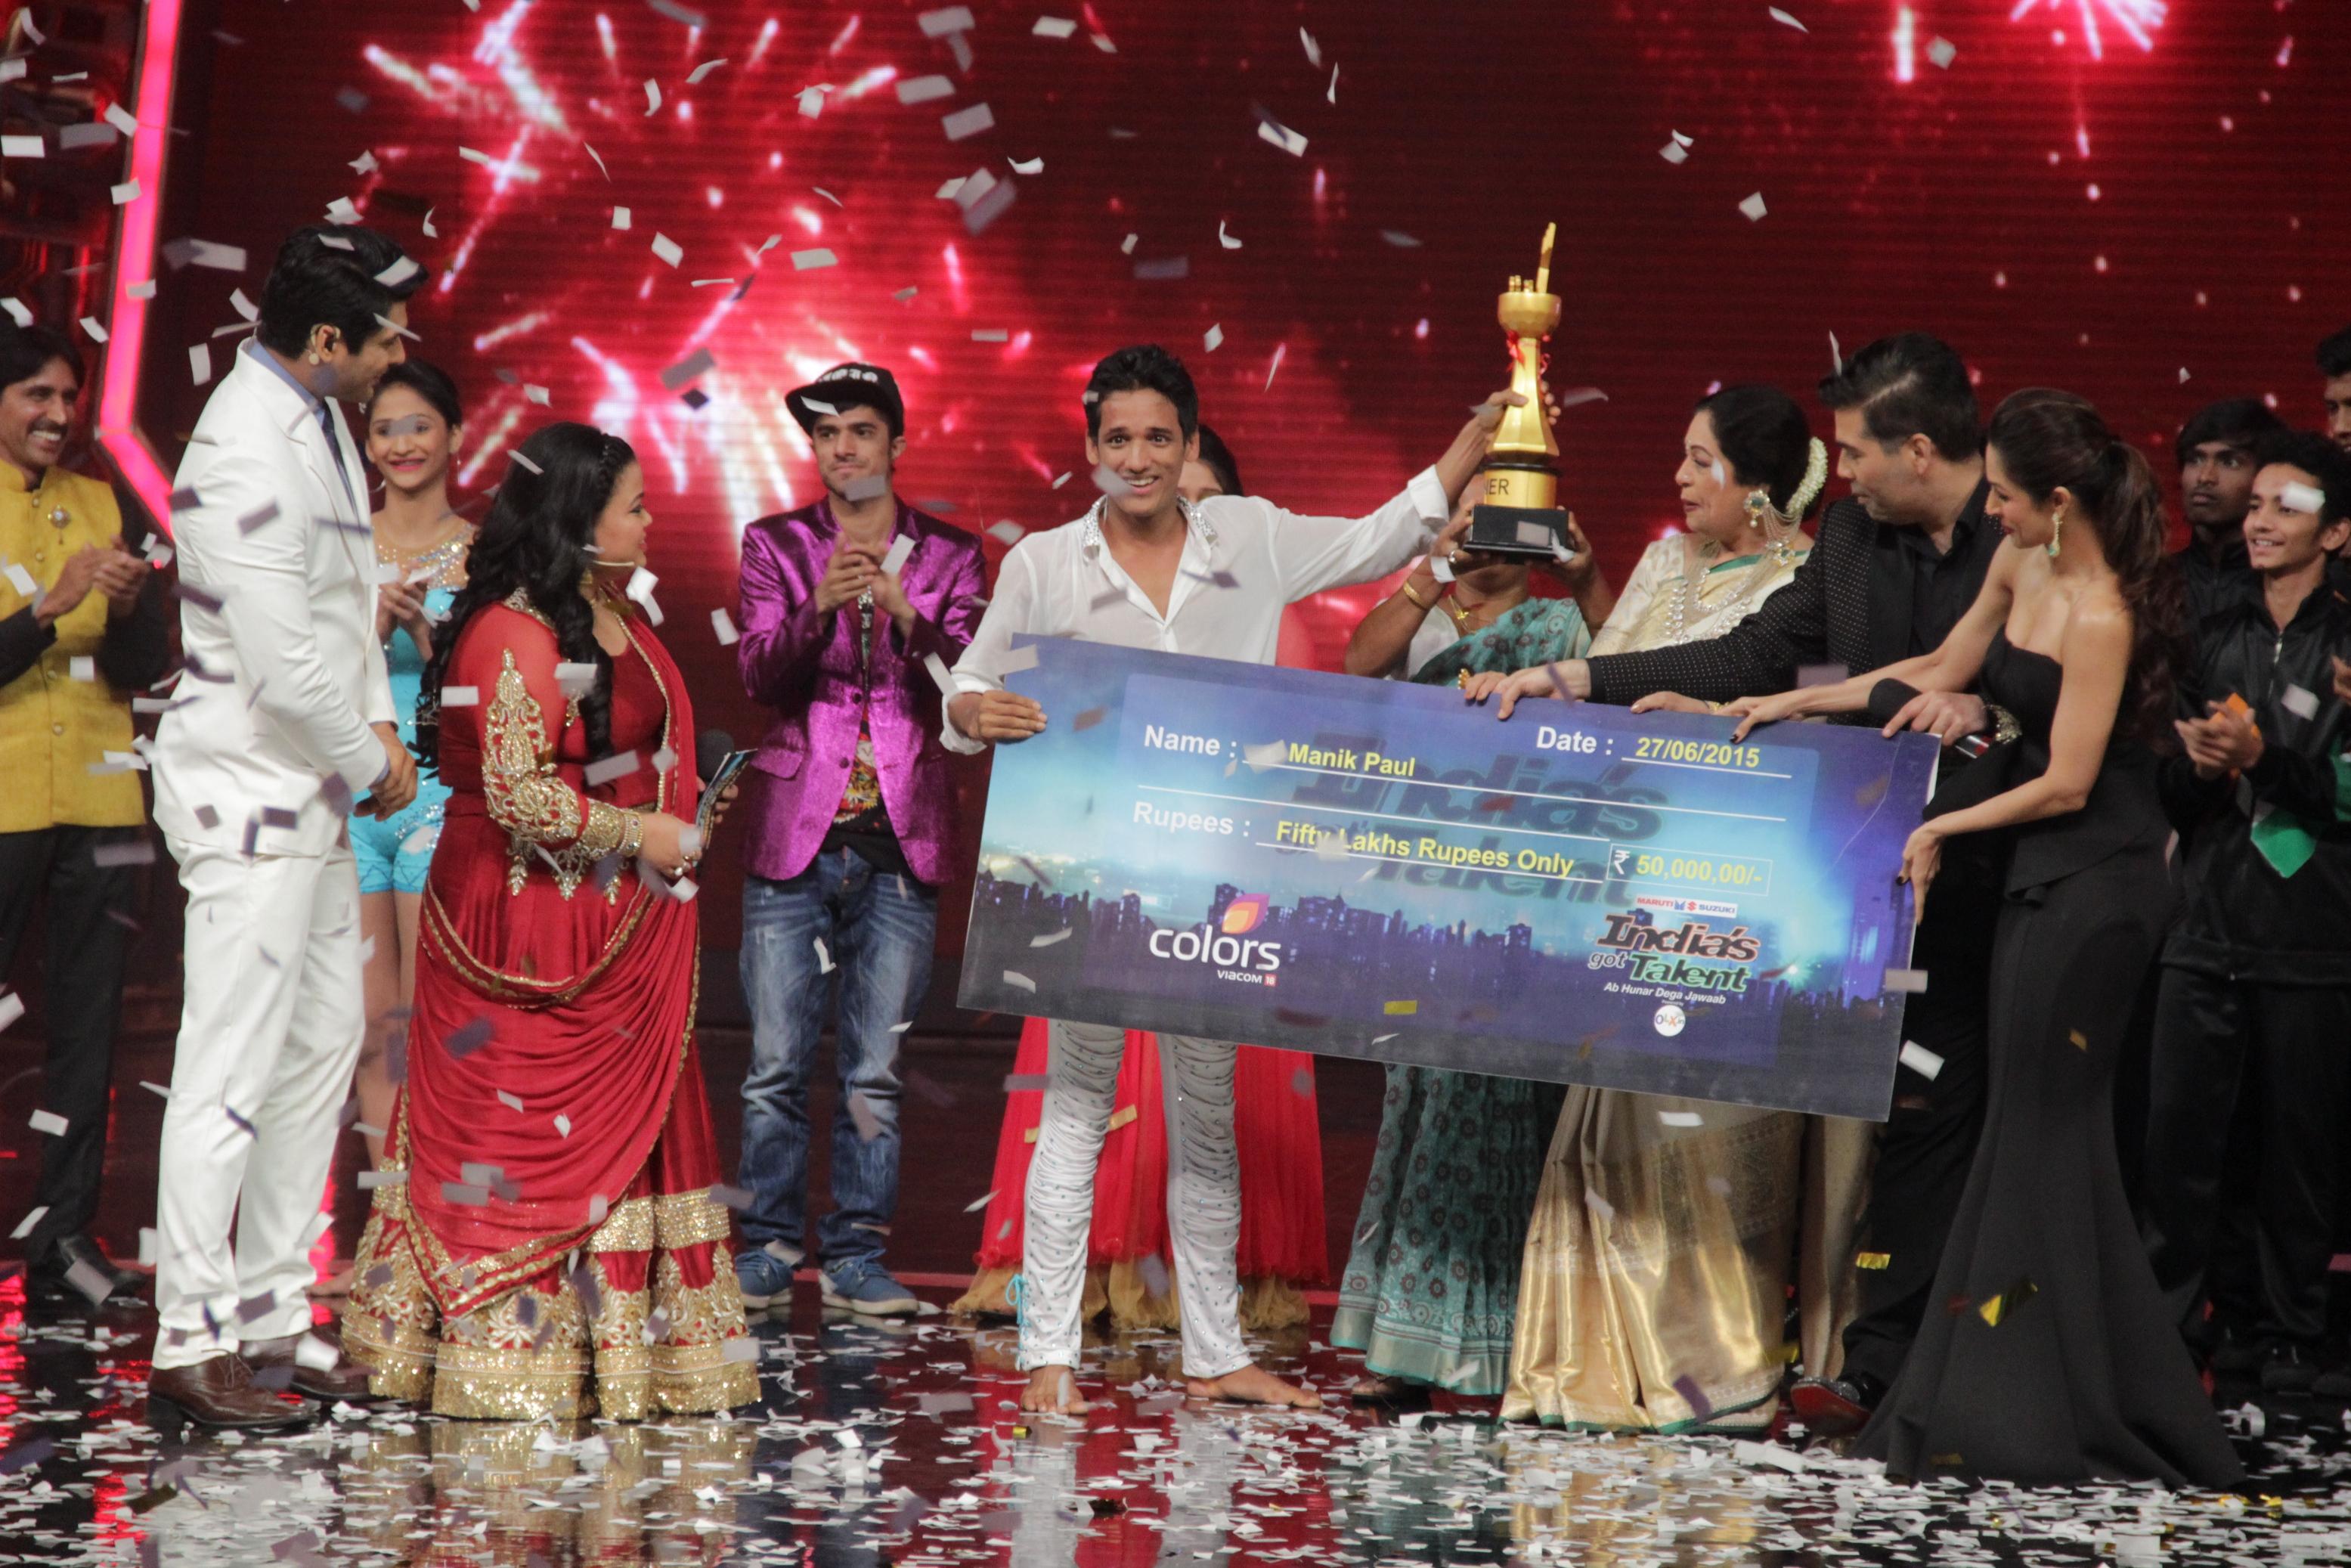 India's Got Talent Winner Name